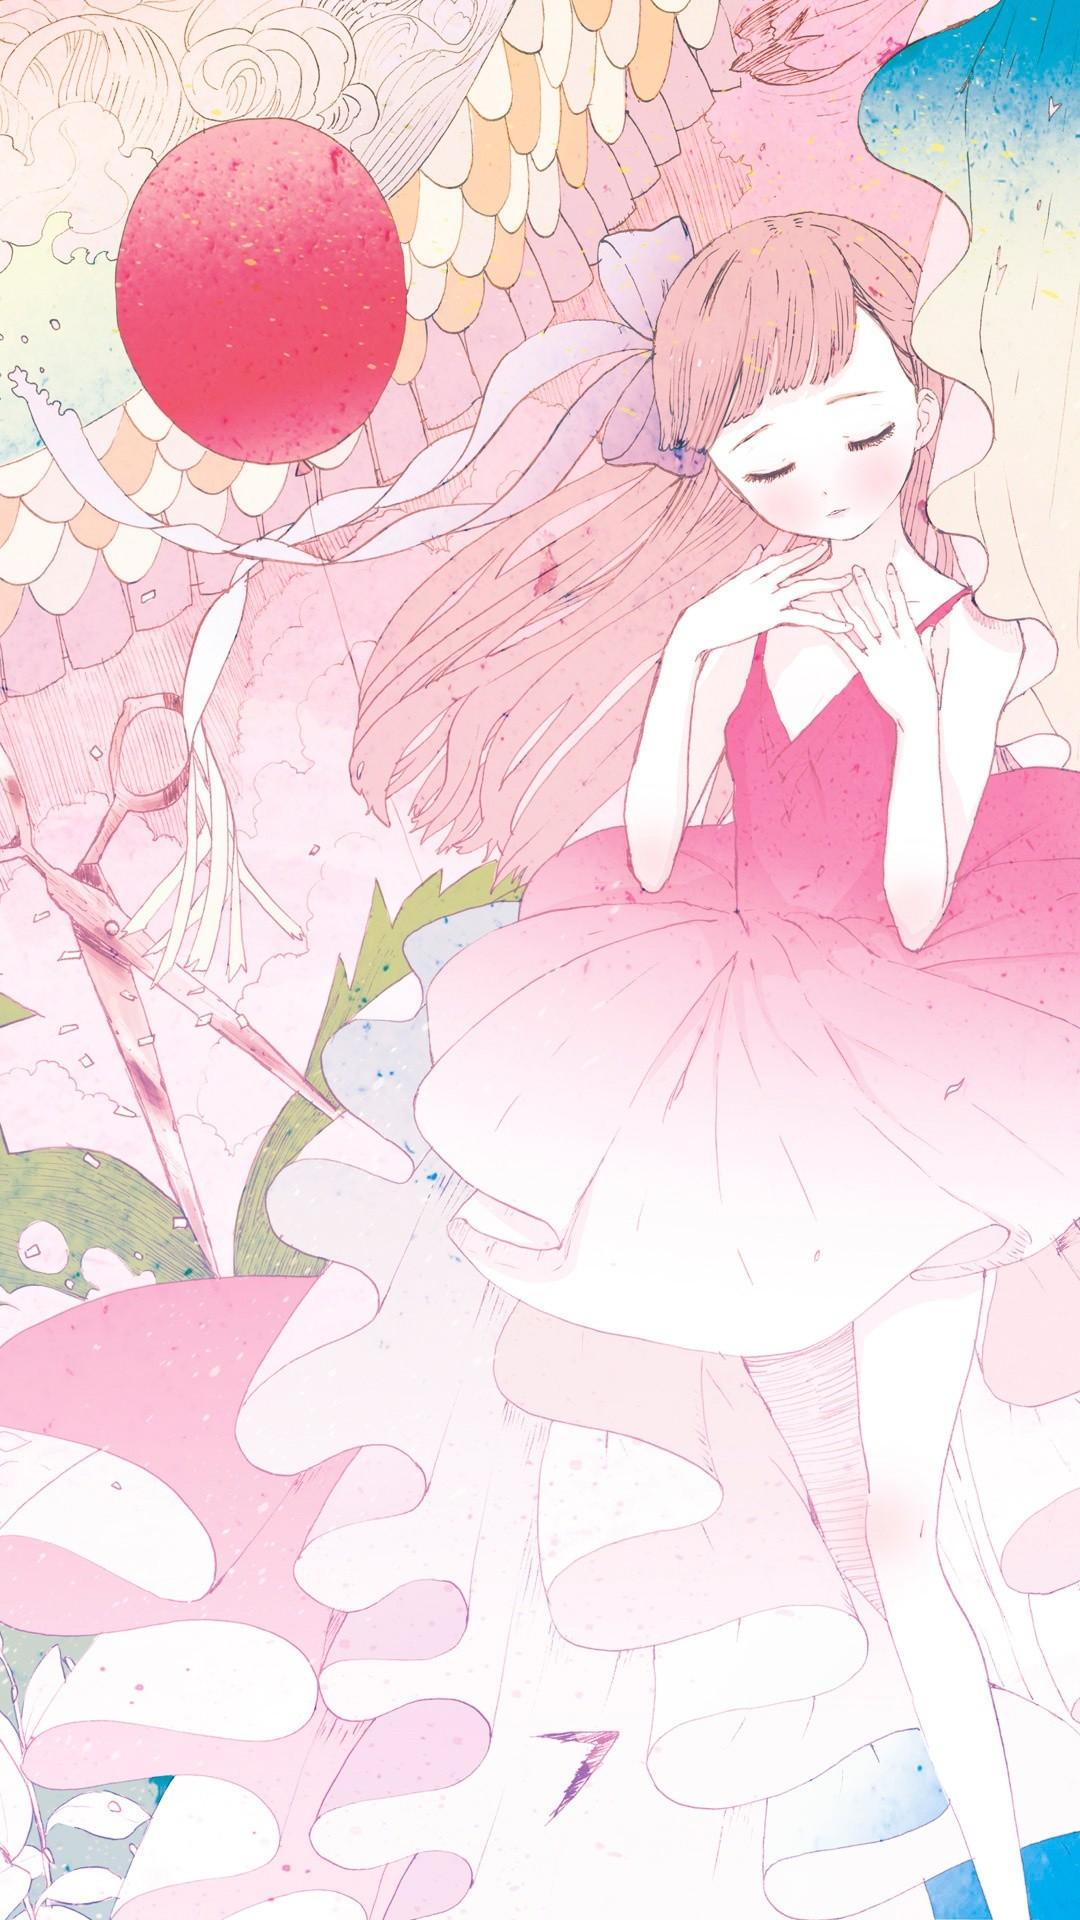 Girl Pink Iphone Wallpapers Anime Girl Phone Screen 1080x1920 Wallpaper Teahub Io